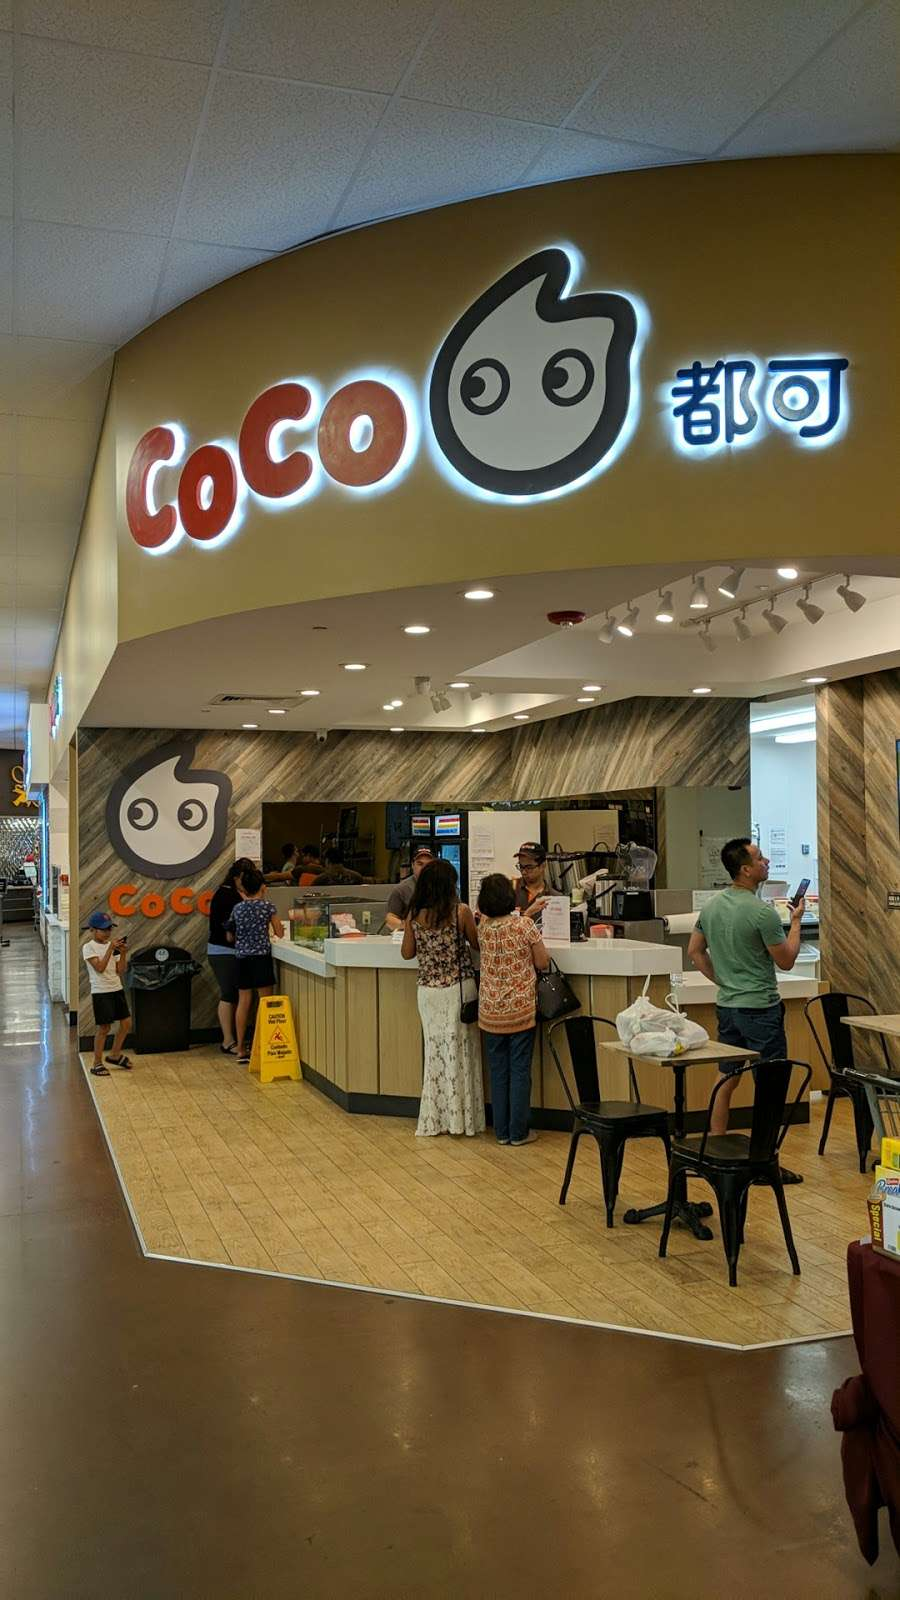 CoCo Fresh Tea & Juice - cafe  | Photo 5 of 8 | Address: 420 Grand St, Jersey City, NJ 07302, USA | Phone: (201) 763-7375